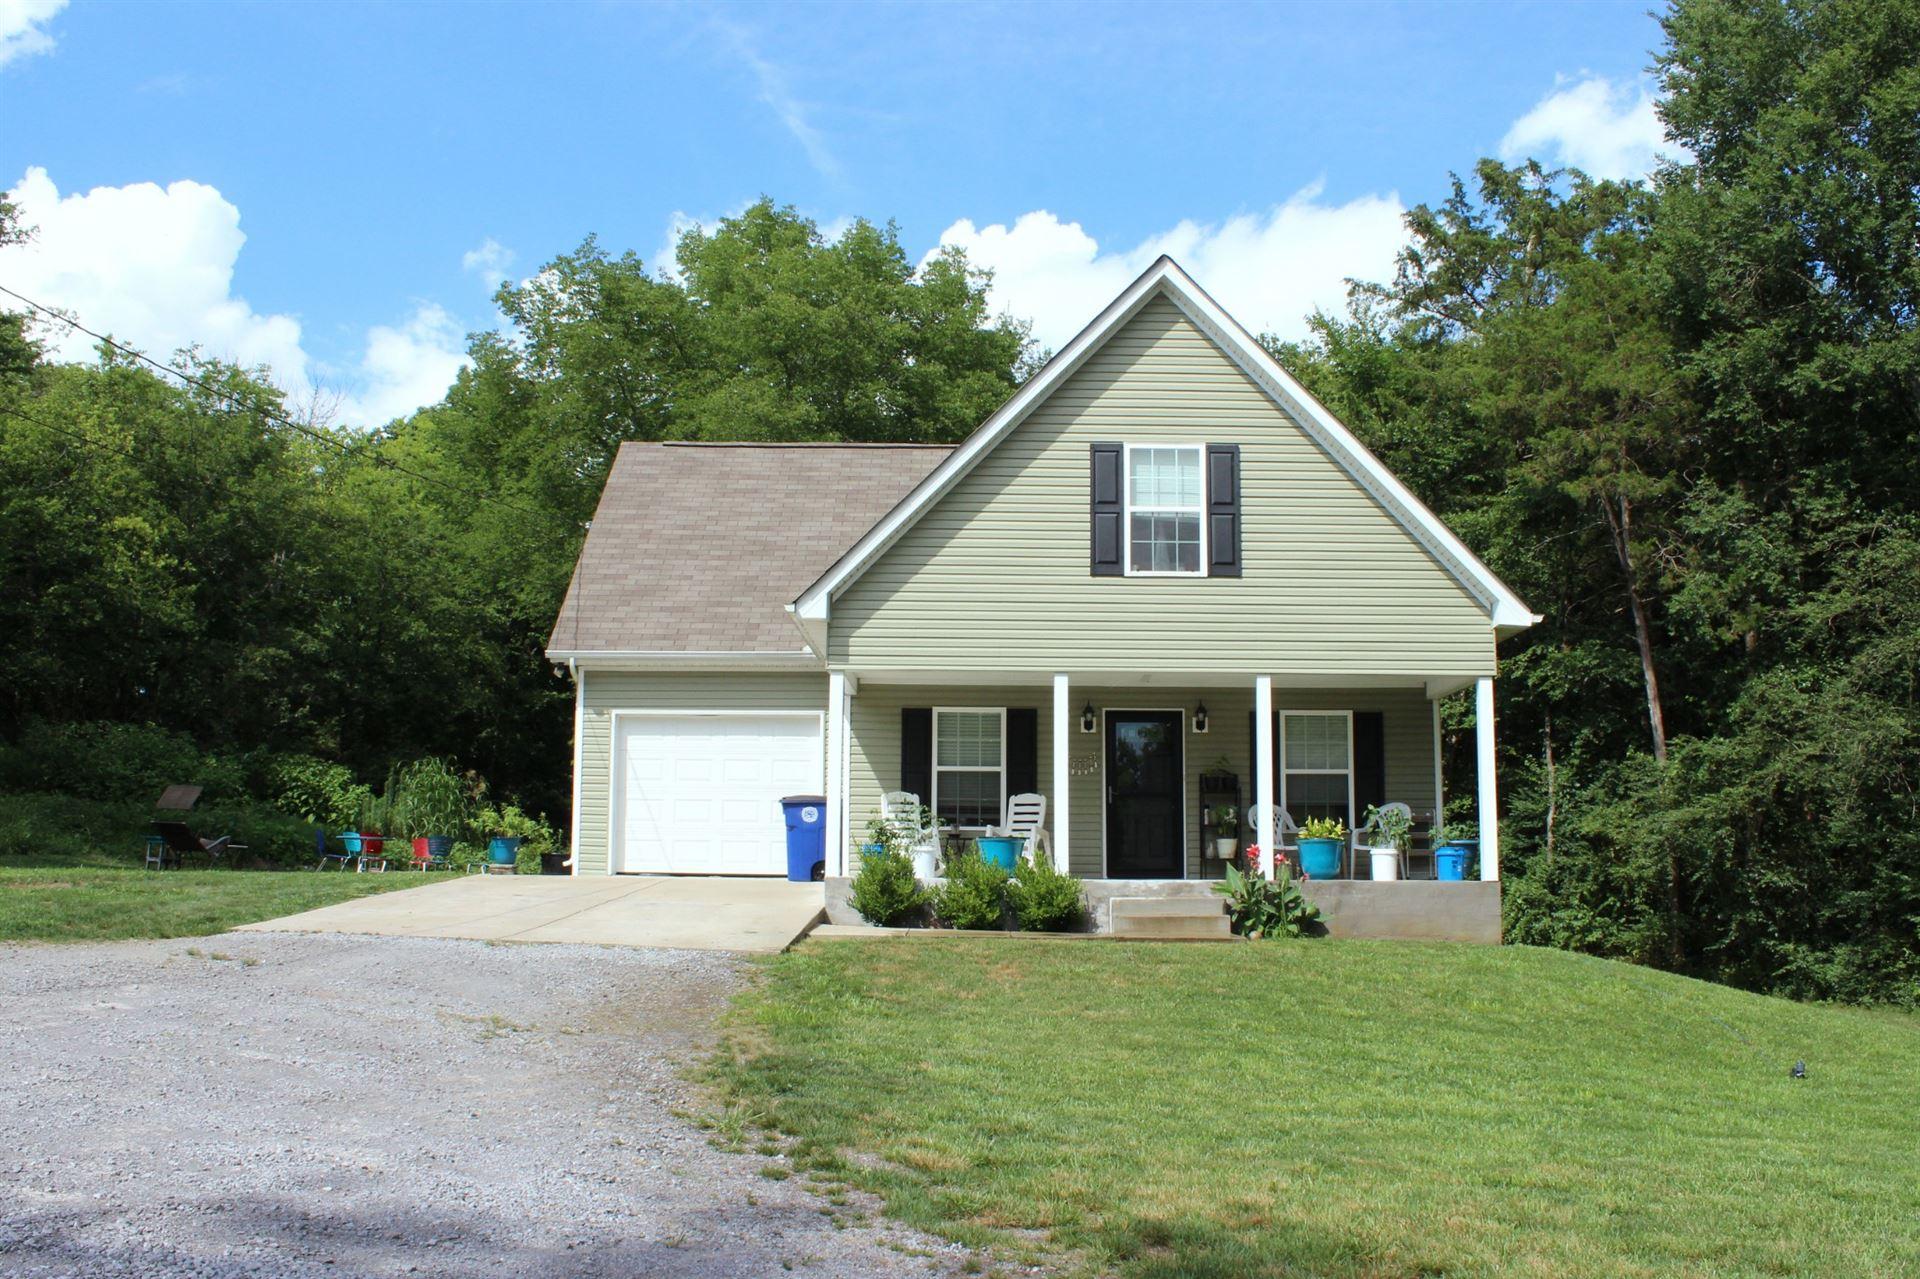 Photo of 643A Mac St, Shelbyville, TN 37160 (MLS # 2167928)